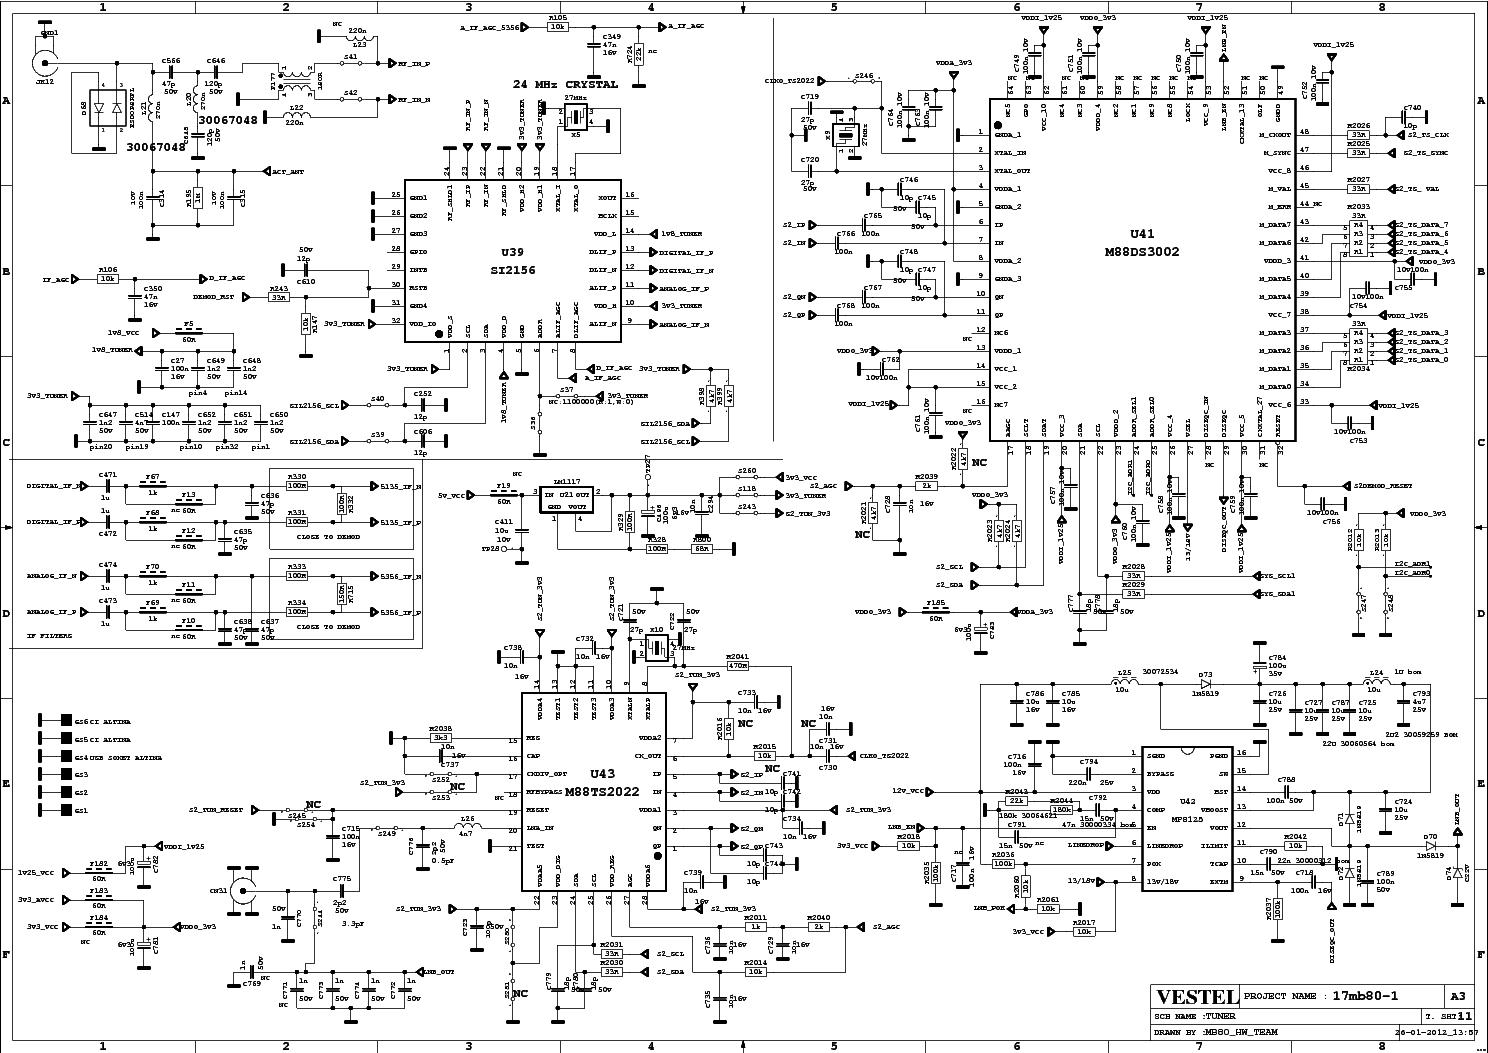 17mb61-2 service